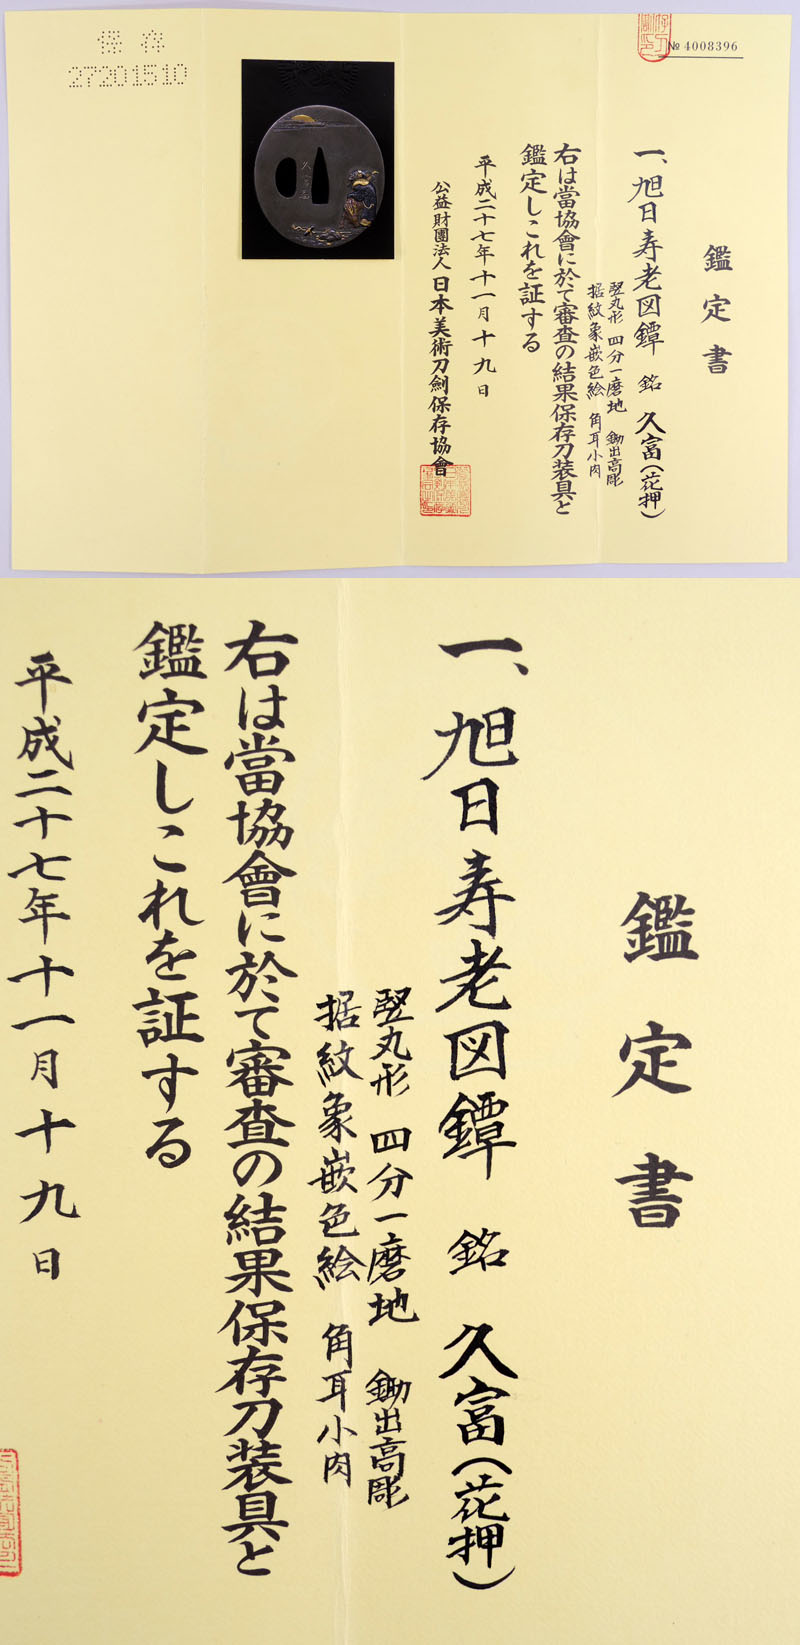 旭日寿老図鍔 久富(花押) Picture of Certificate